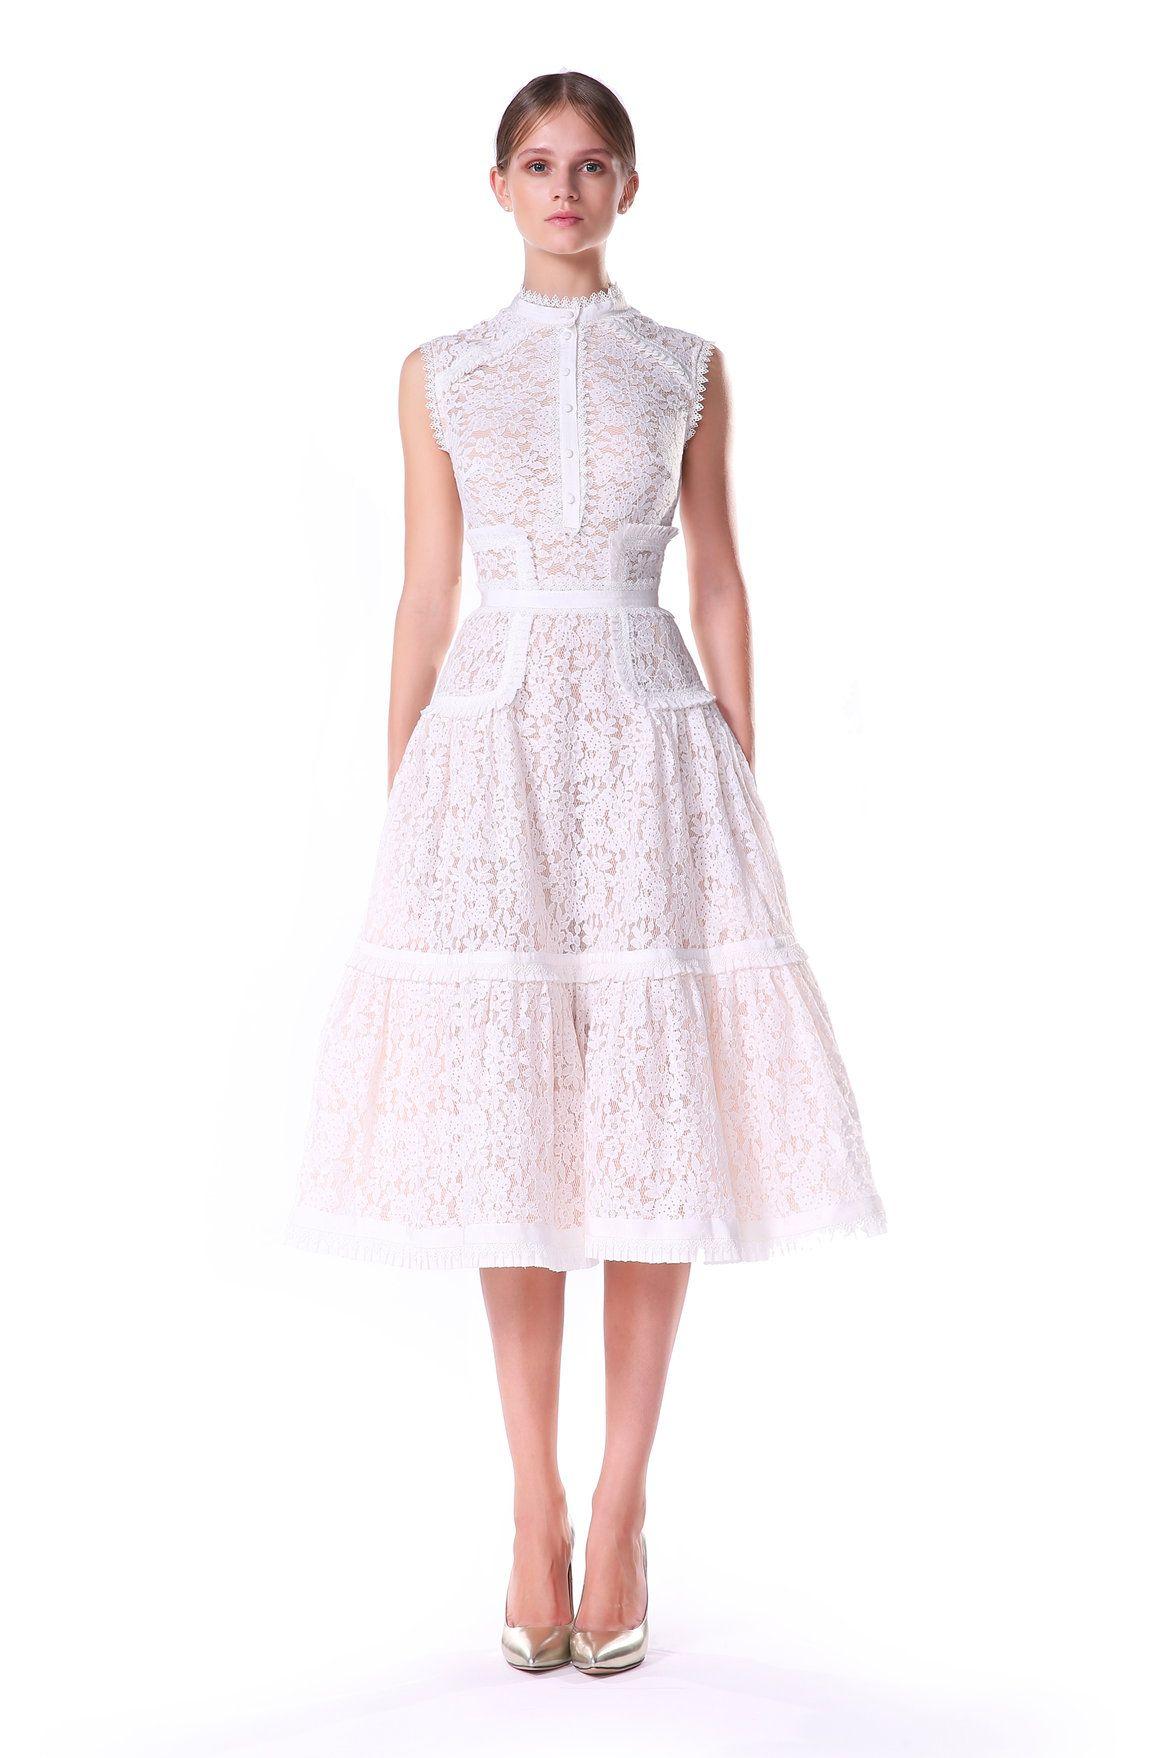 Dressesamp; Fashion For Designer Clothes Garcia WomenIsabel N0OPw8Xnk